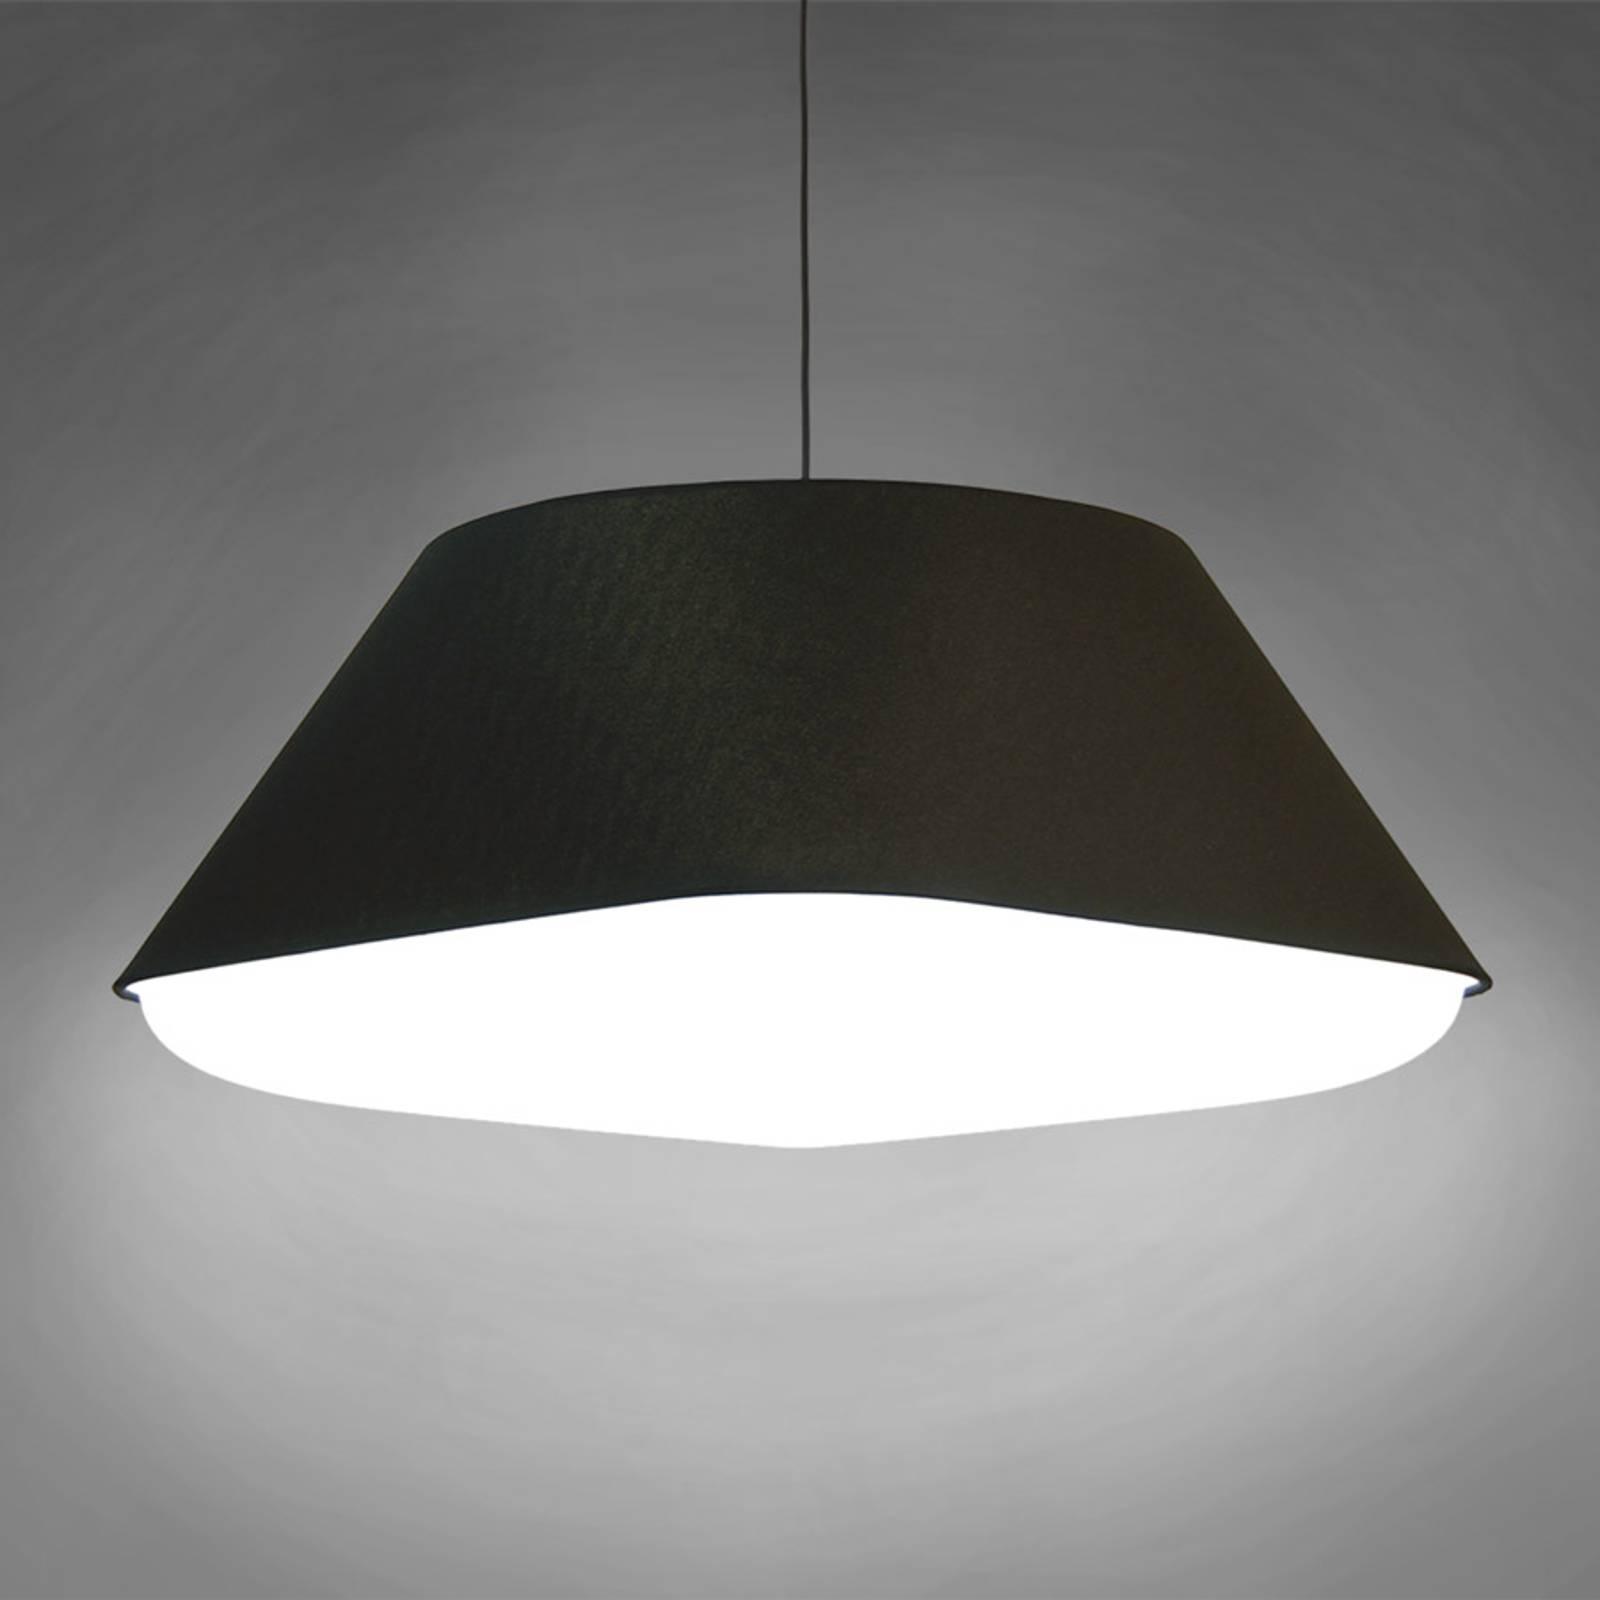 Innermost RD2SQ 60 - textiel-hanglamp, zwart